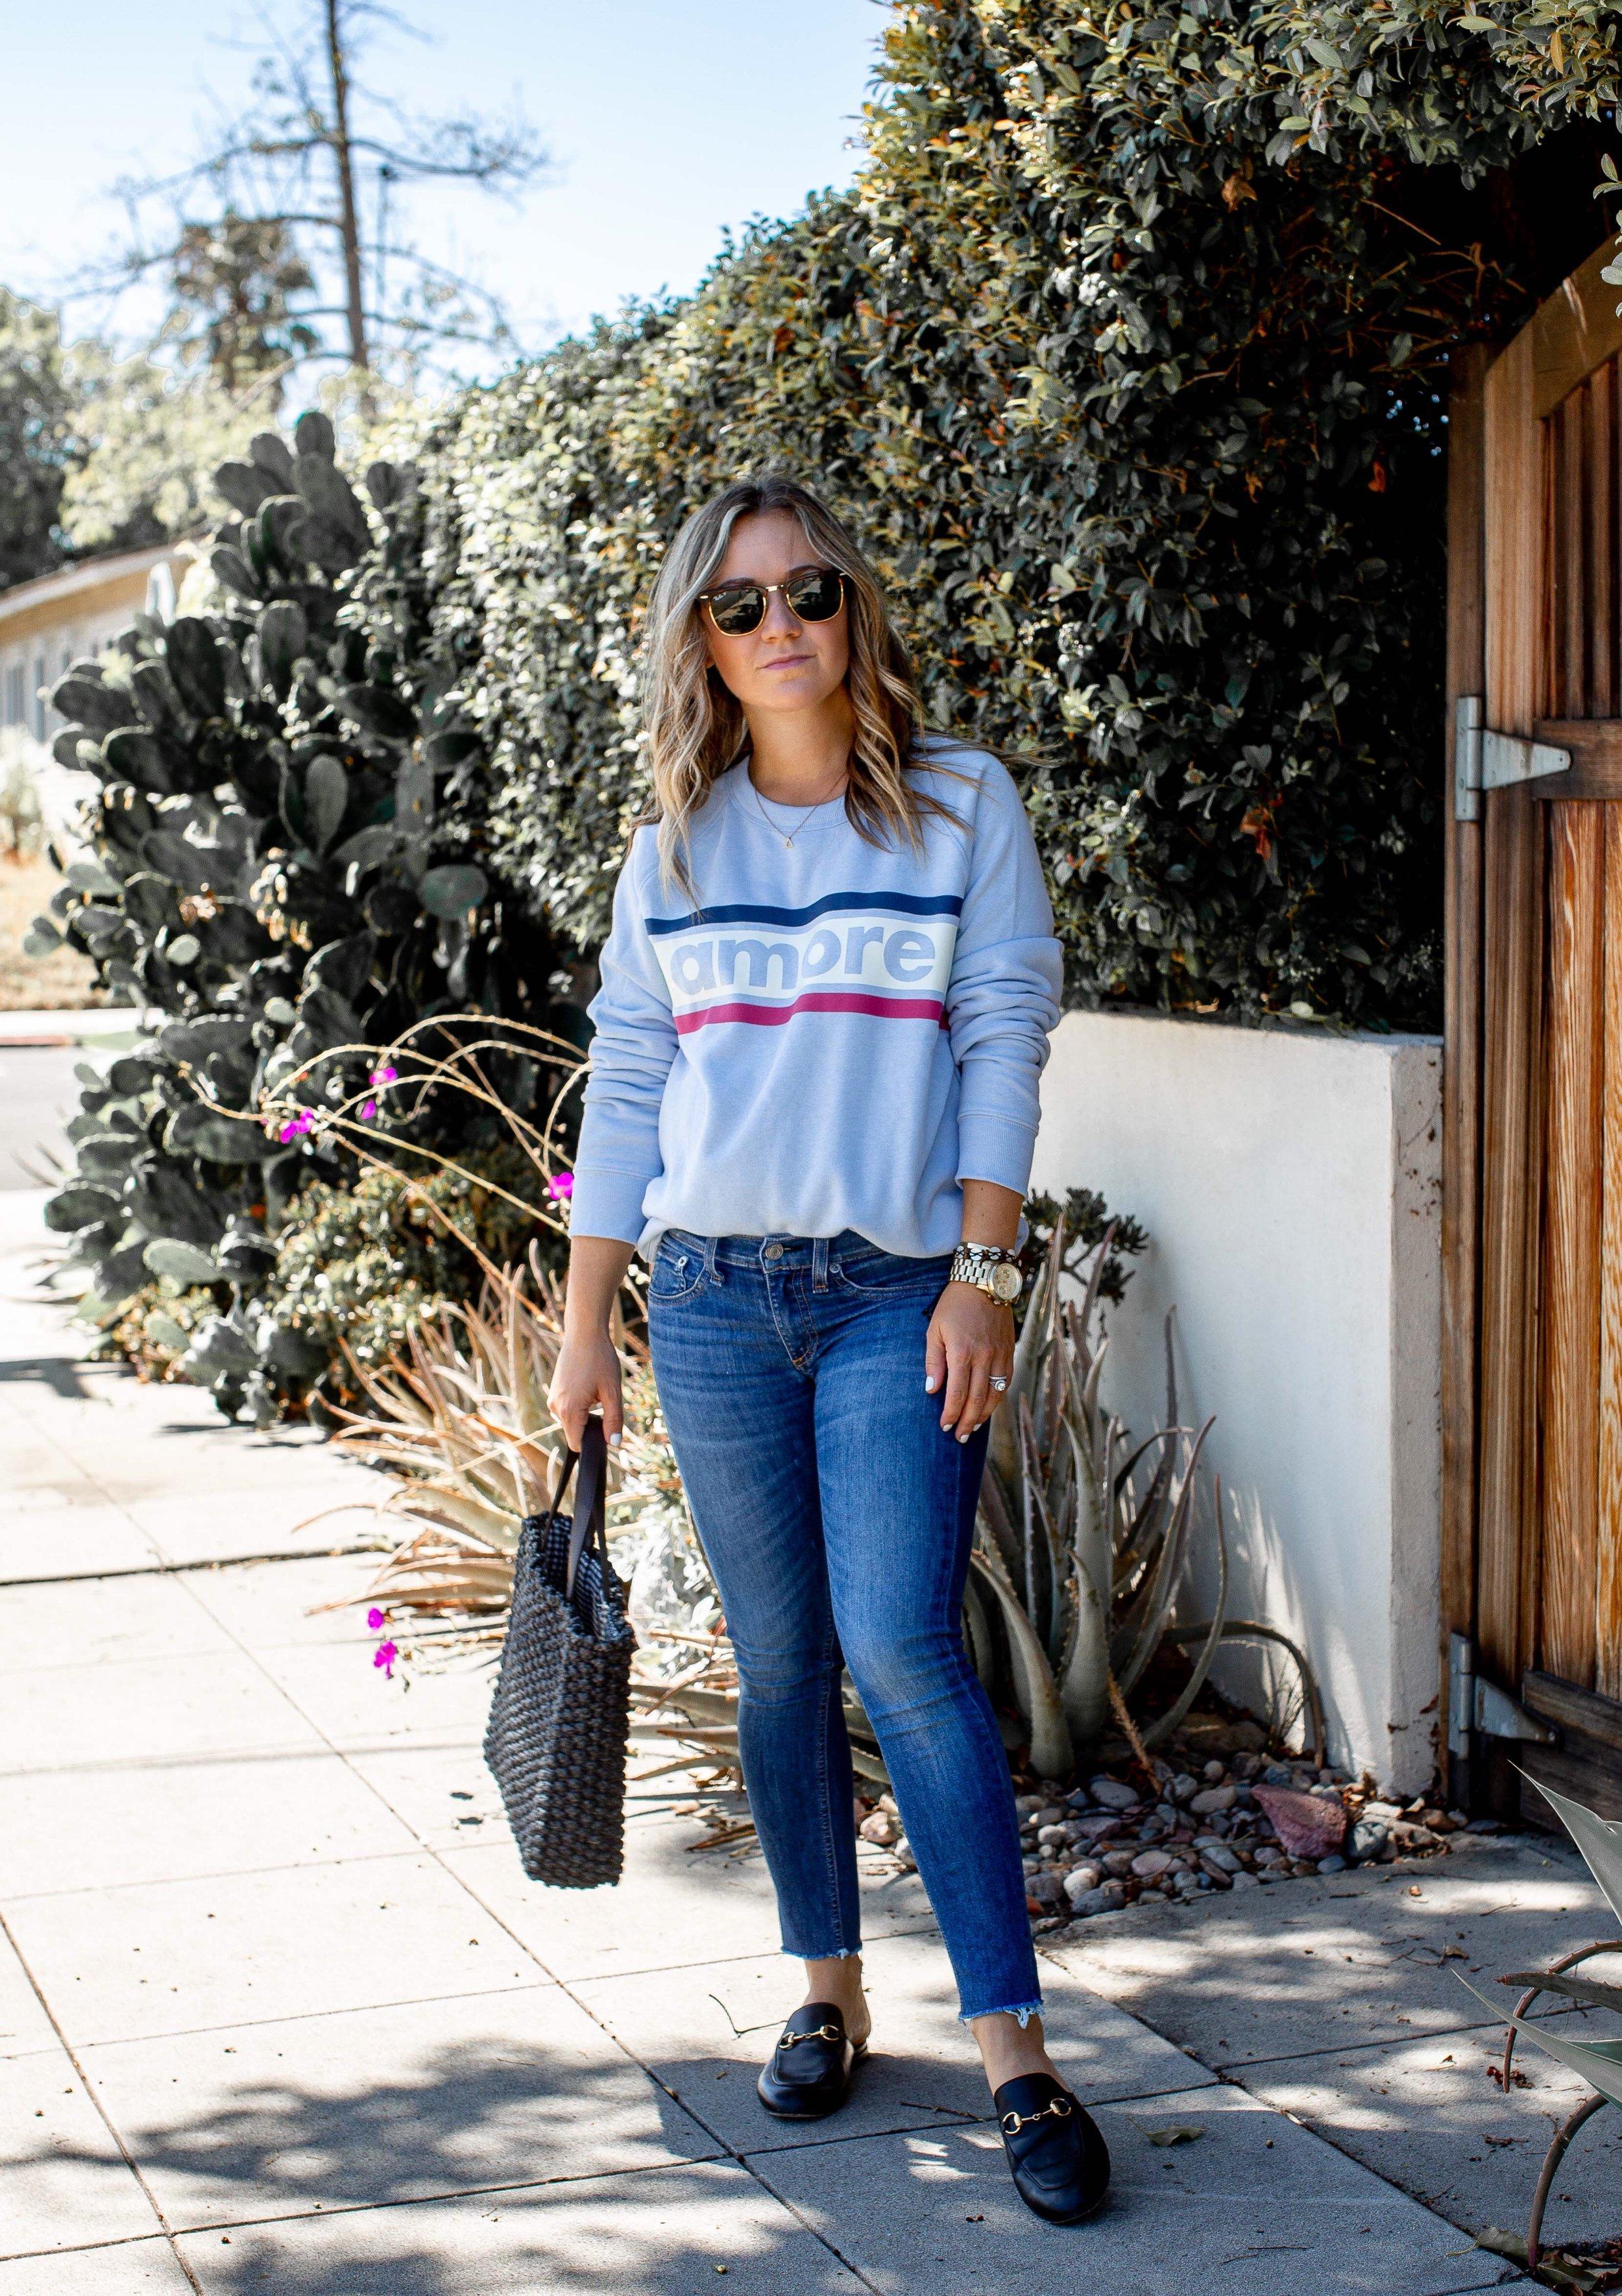 fizz-fade-blue-graphic-sweatshirt6.JPG